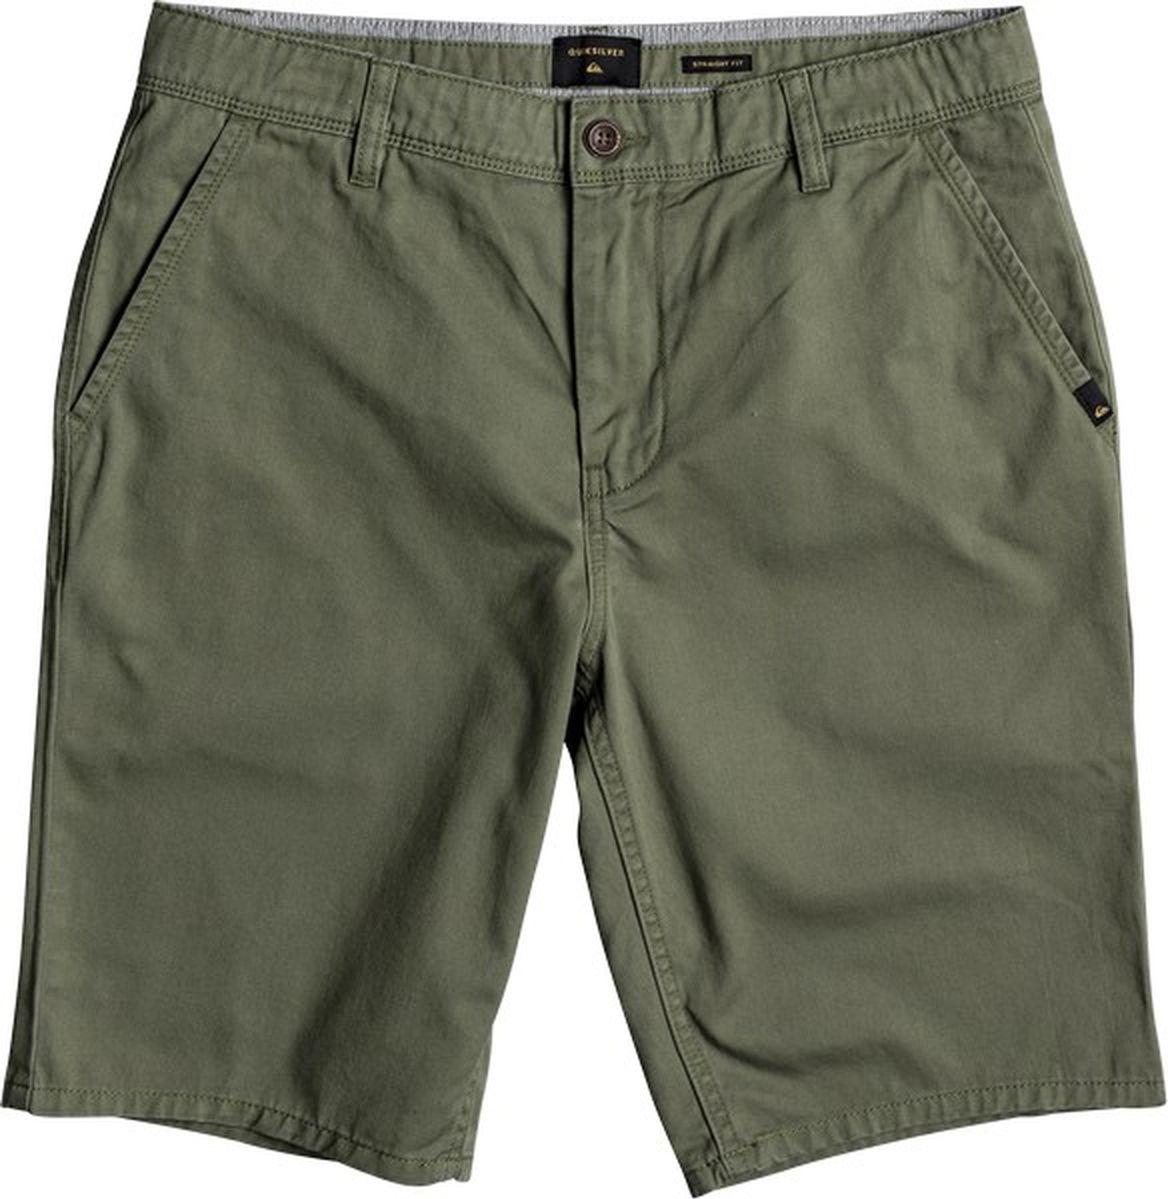 Шорты мужские Quiksilver, цвет: зеленый. EQYWS03468-GPH0. Размер 38 (54)